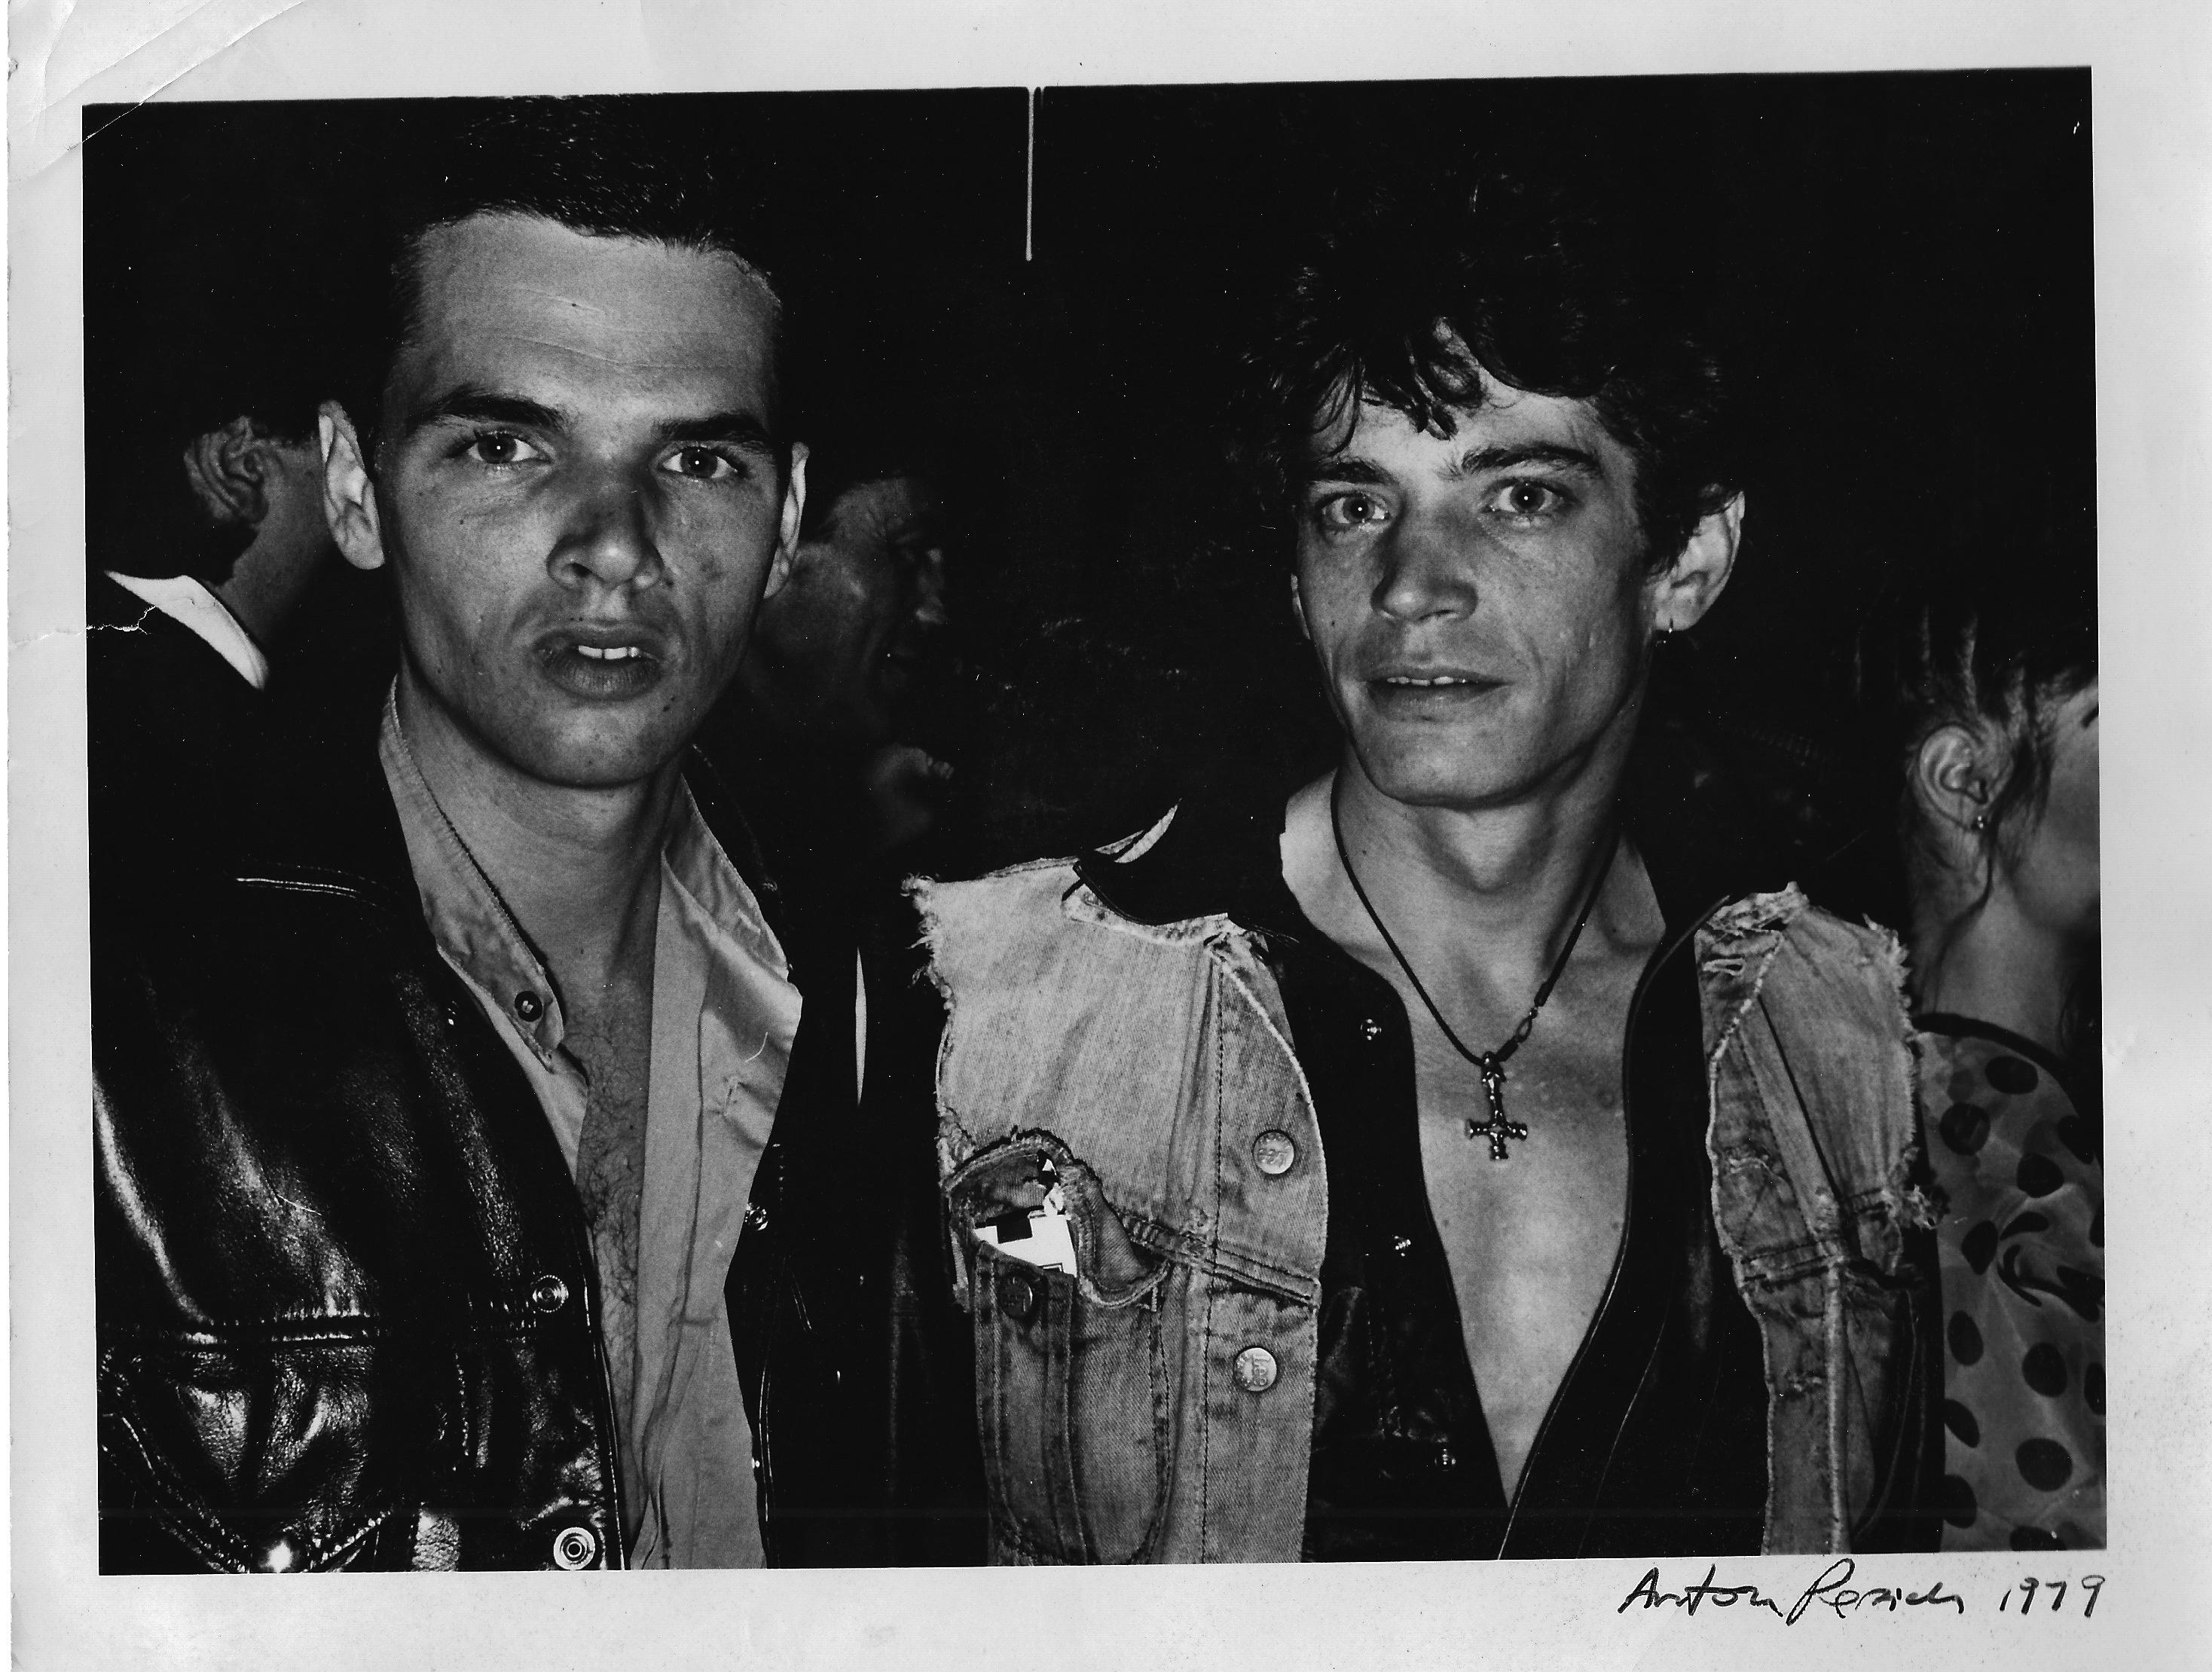 Studio 54. Robert & me. Anton Parish 1979 4.1_GAYLETTER